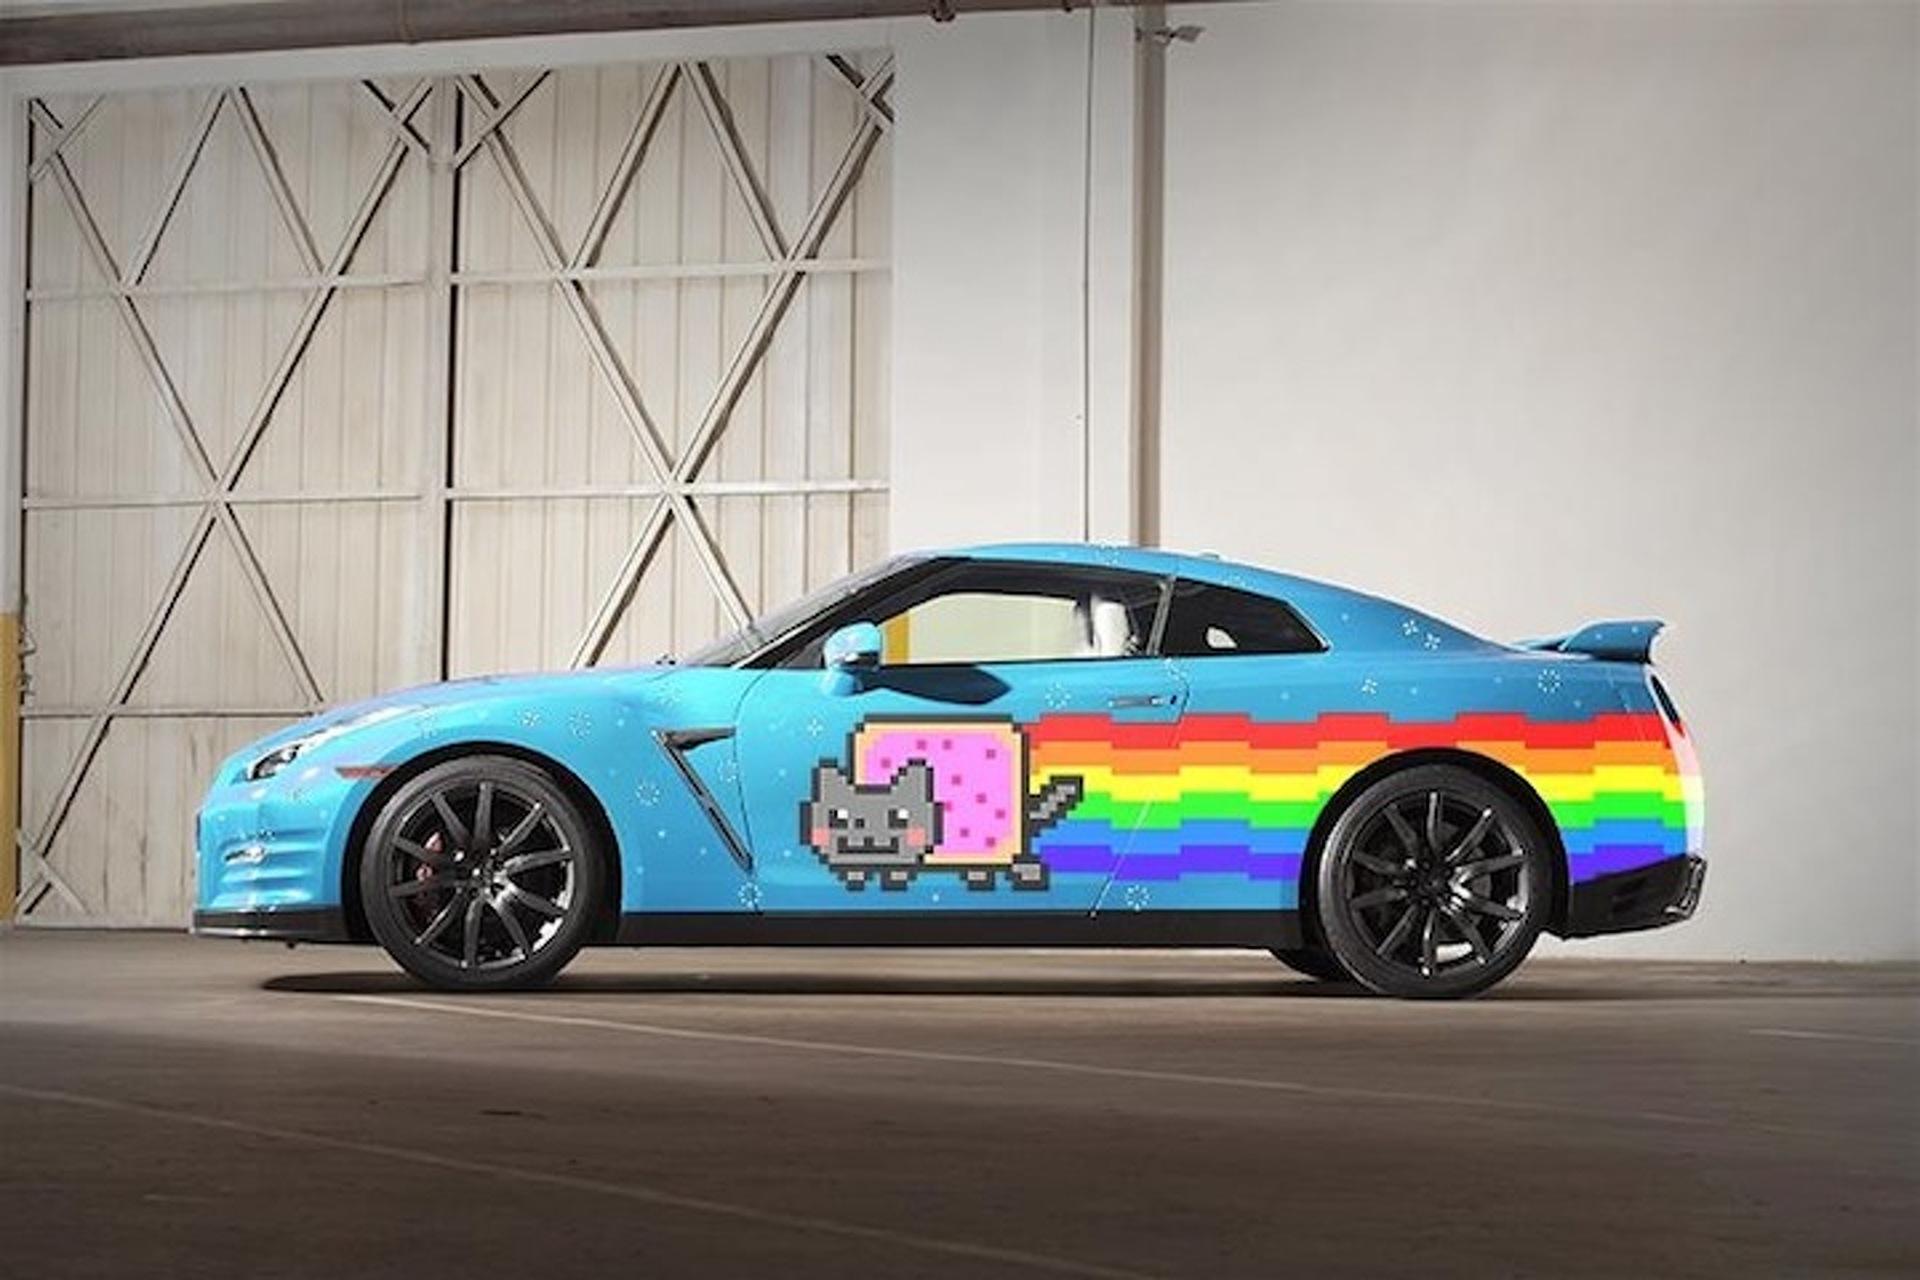 Nissan Pokes Fun at Ferrari with Nyan Cat GT-R